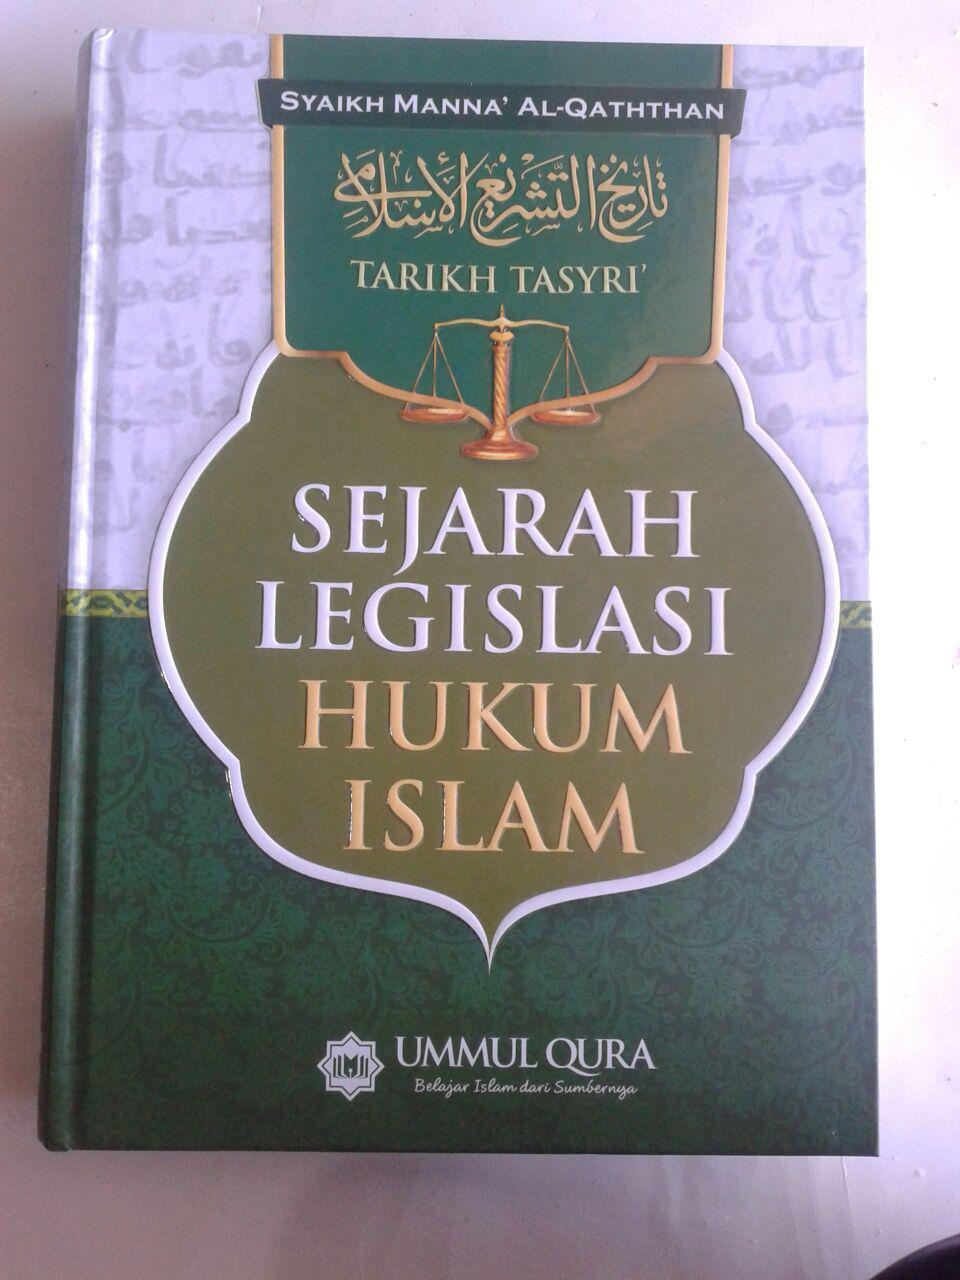 Buku Tarikh Tasyri Sejarah Legislasi Hukum Islam cover 2